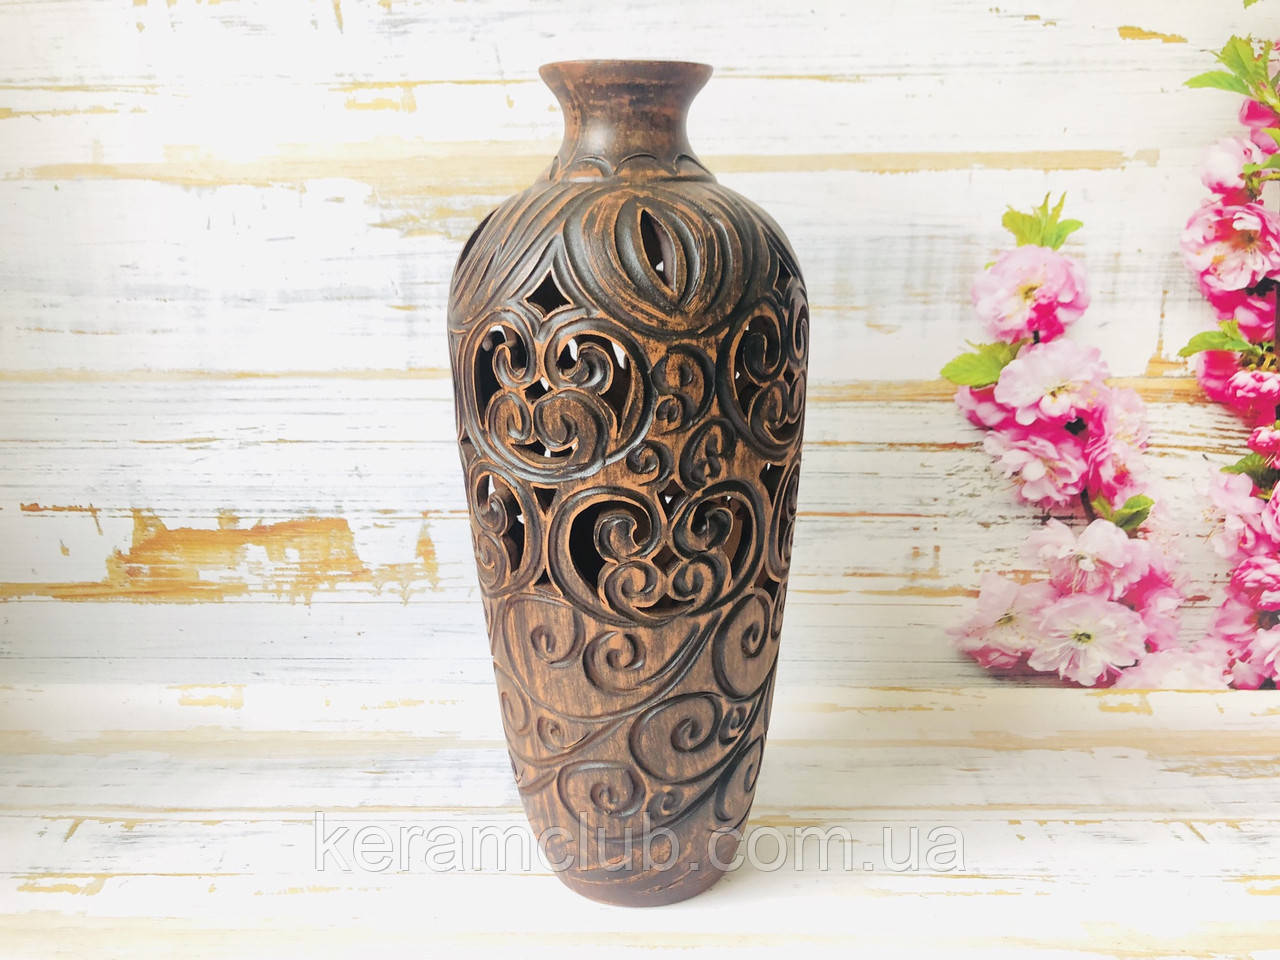 Глиняная ваза ручной работы h 33 см